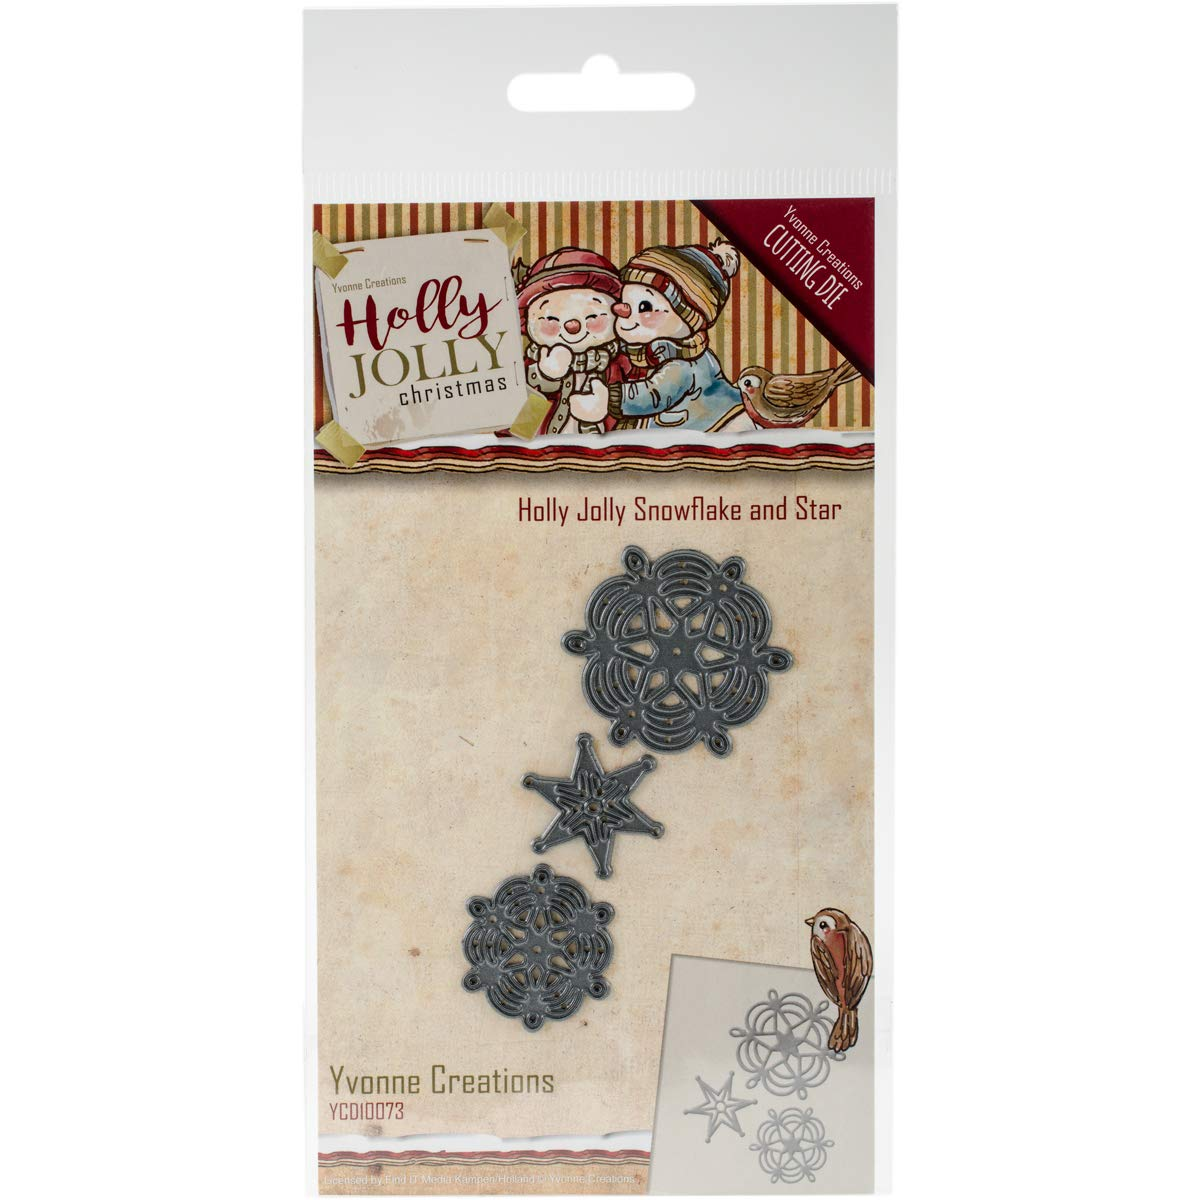 Find It Trading YCD10073 Snowflake & Star Yvonne Creations Holly Jolly Die B01KS0IM2O